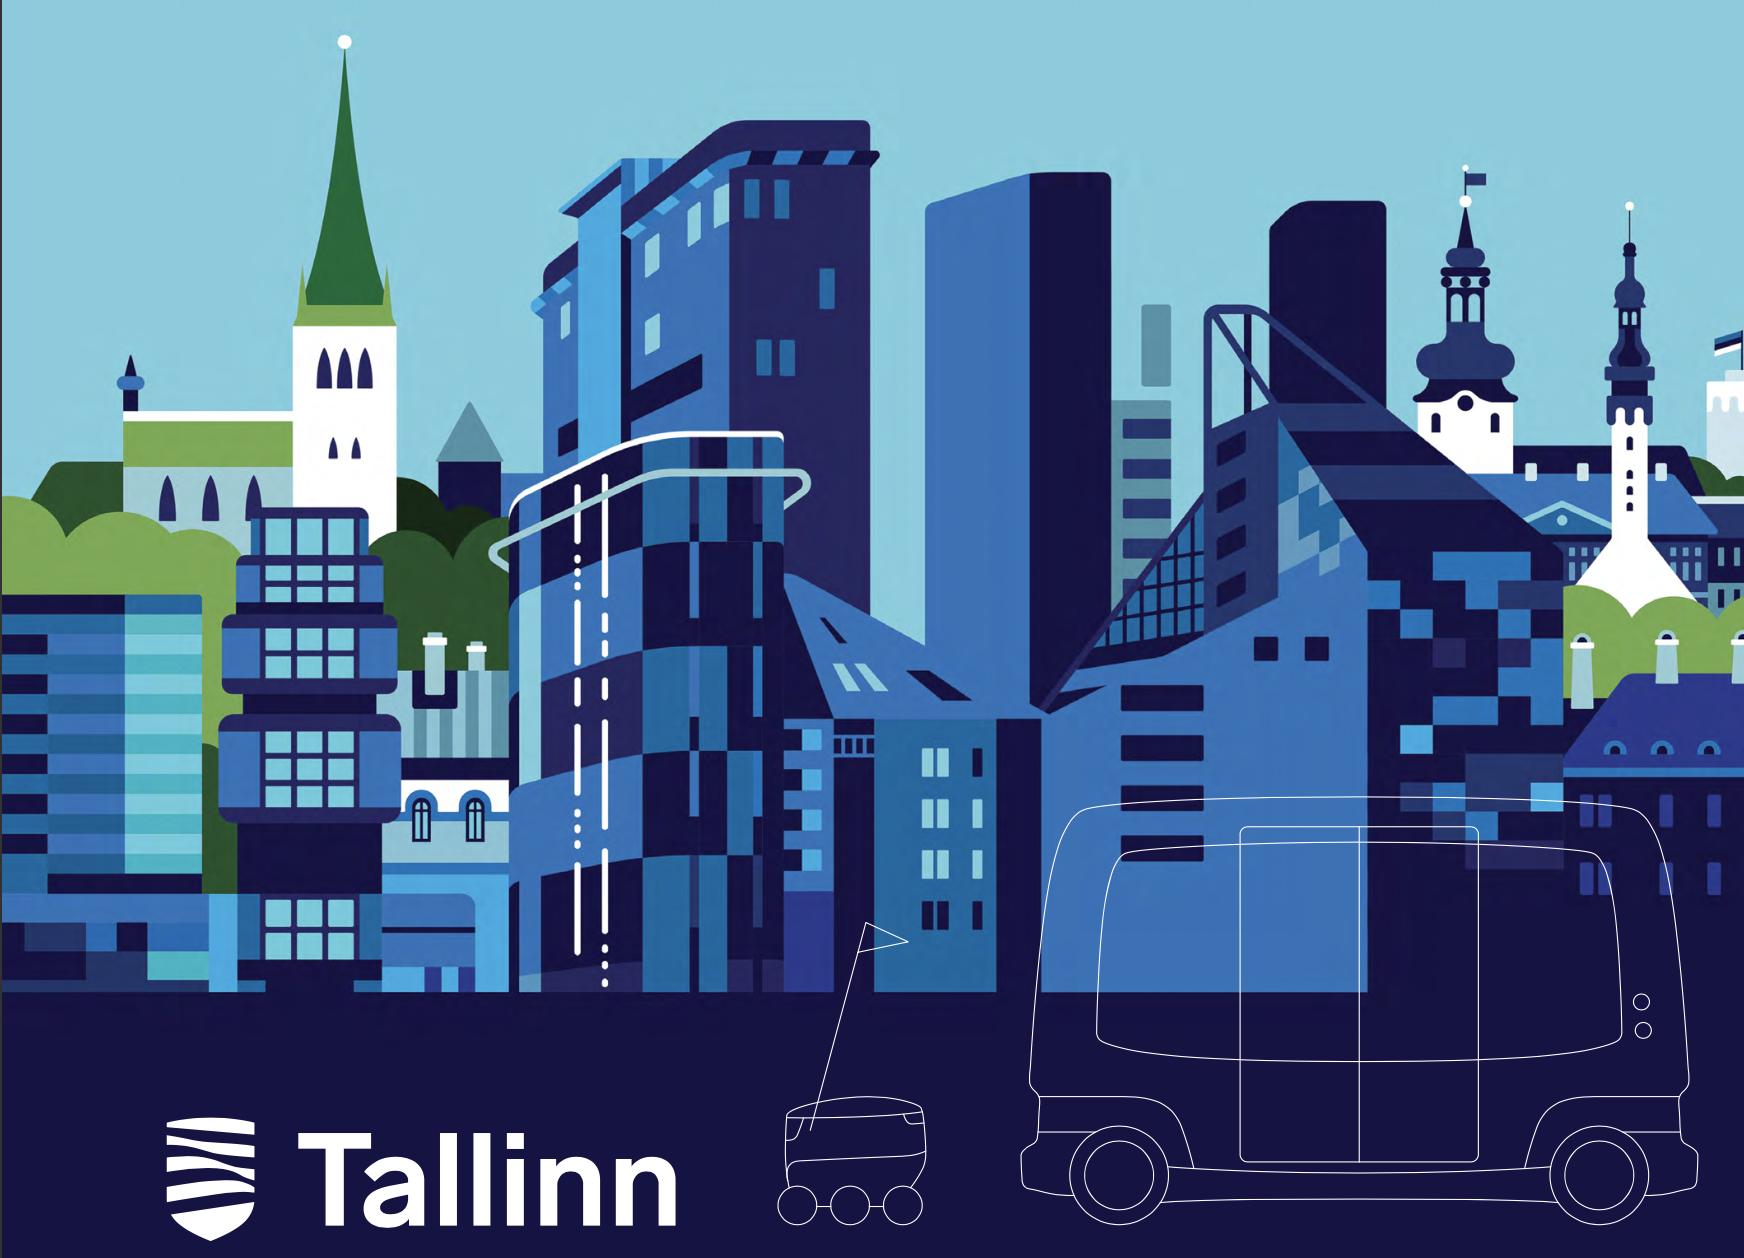 Tallinn smart city